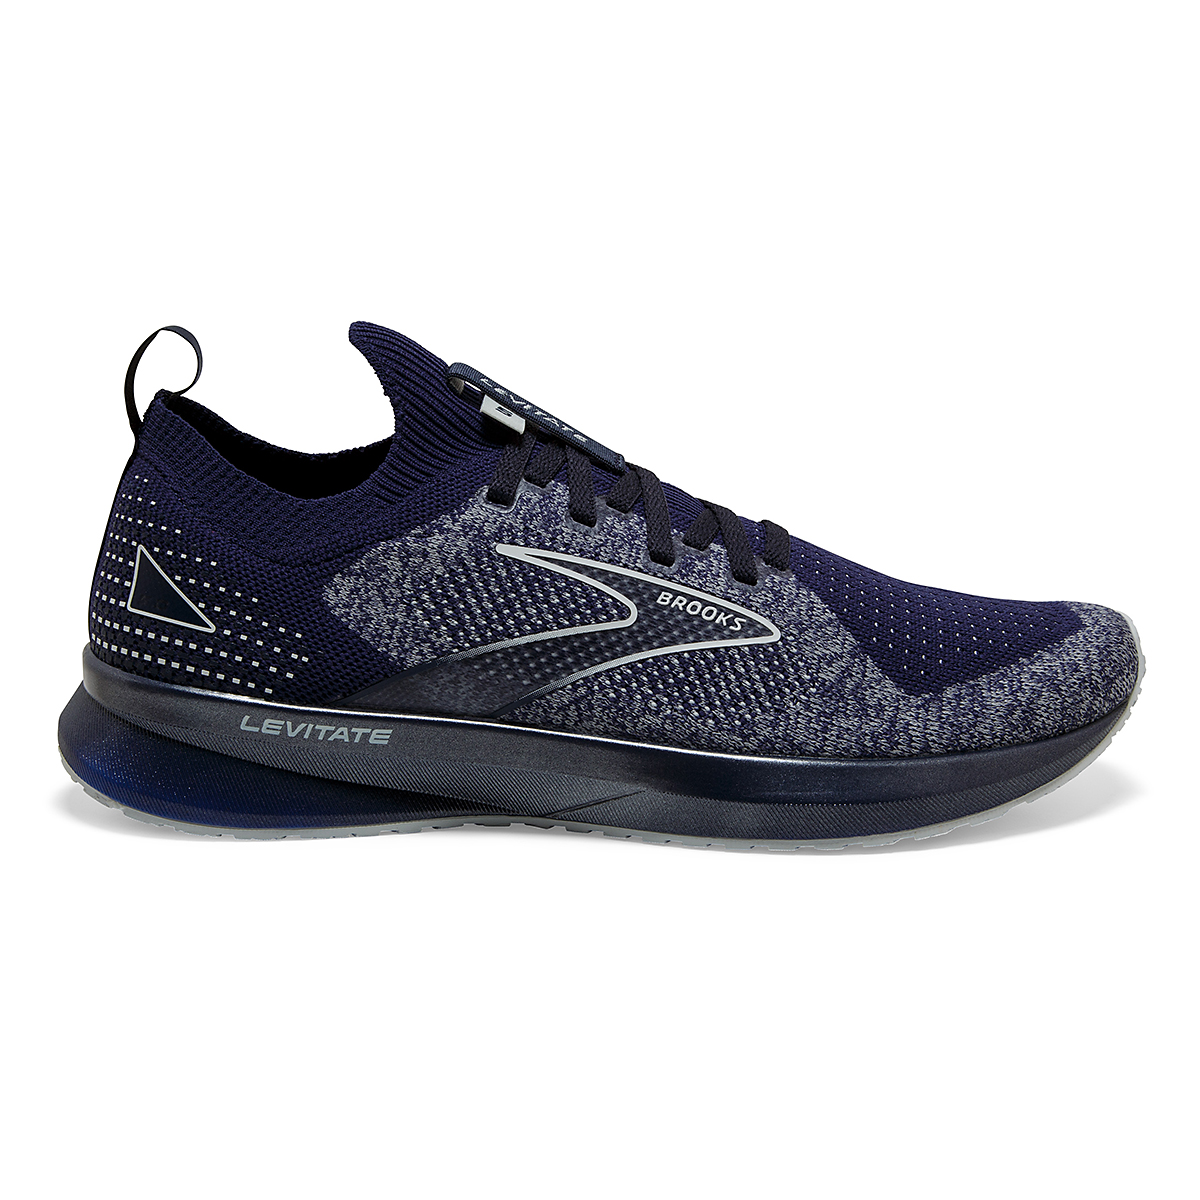 Men's Brooks Levitate Stealthfit 5 Running Shoe - Color: Peacoat/Grey - Size: 7 - Width: Regular, Peacoat/Grey, large, image 1